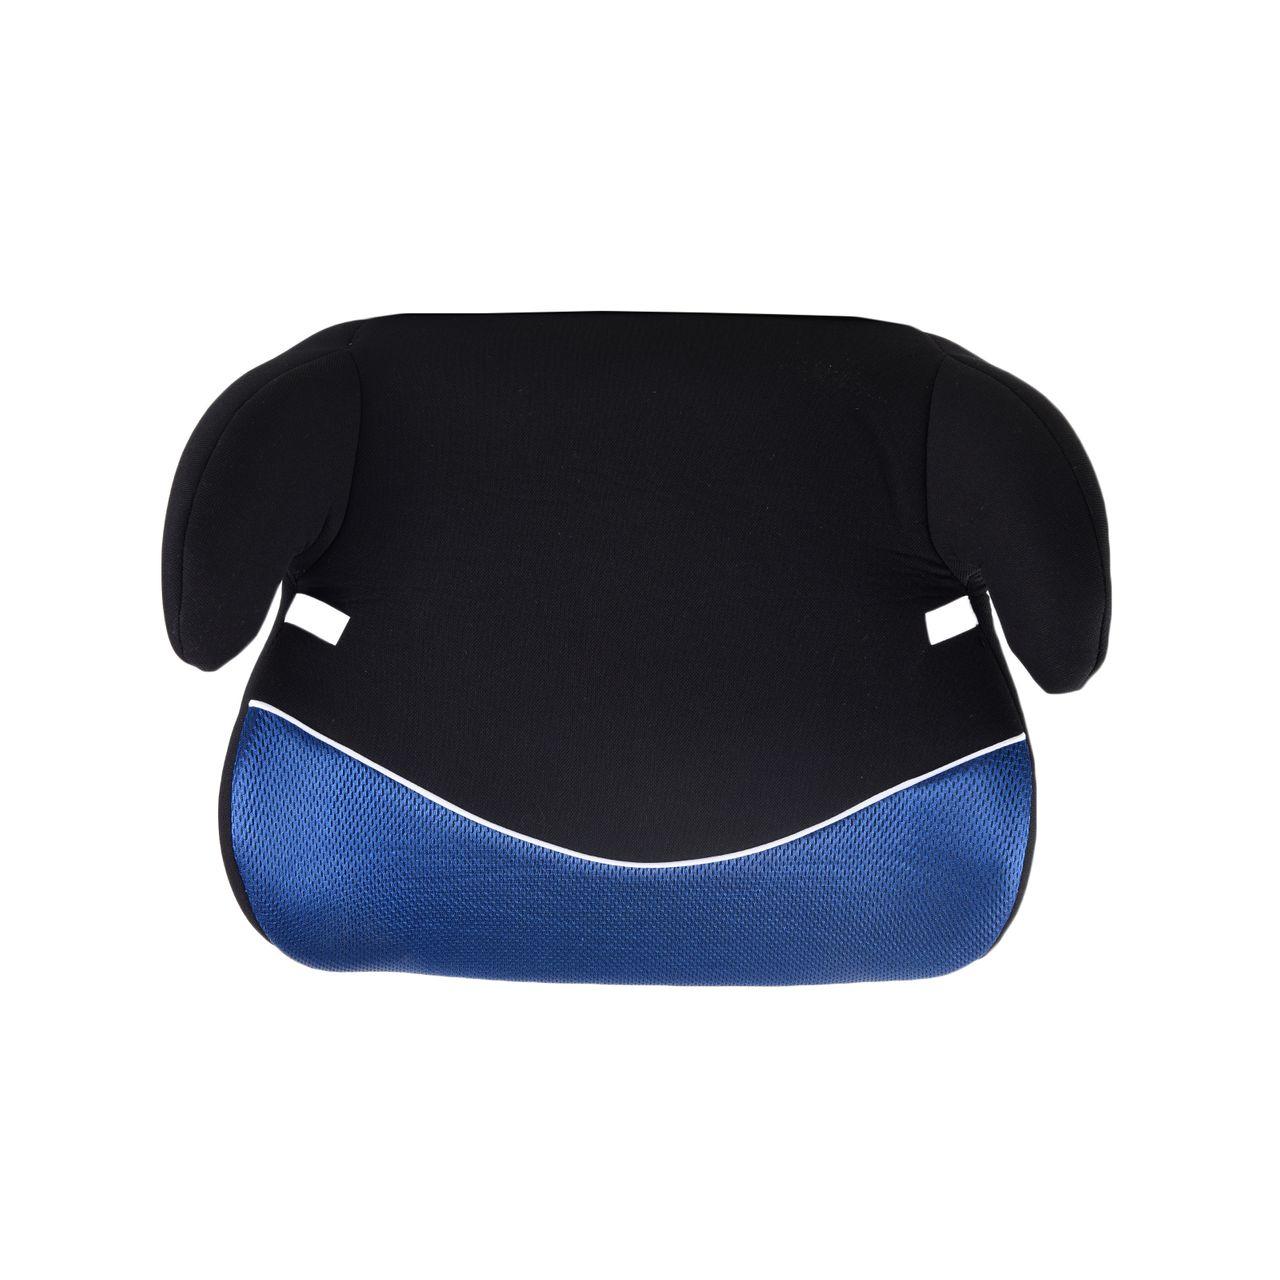 autositz kinder sitzerh hung kissen autokindersitz. Black Bedroom Furniture Sets. Home Design Ideas